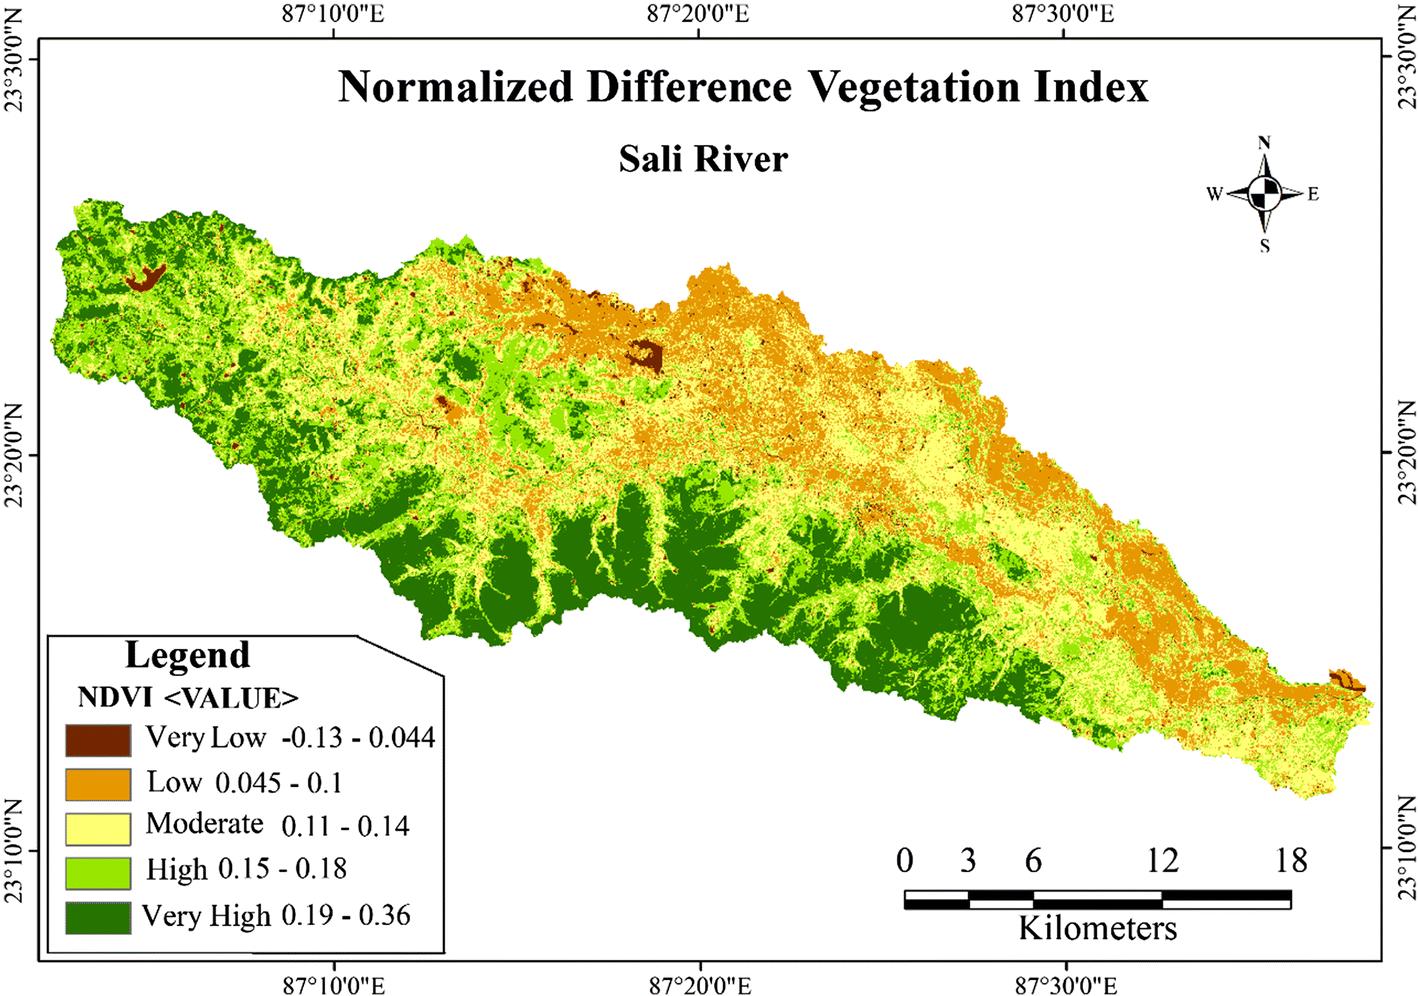 Assessment of vegetation status of Sali River basin, a